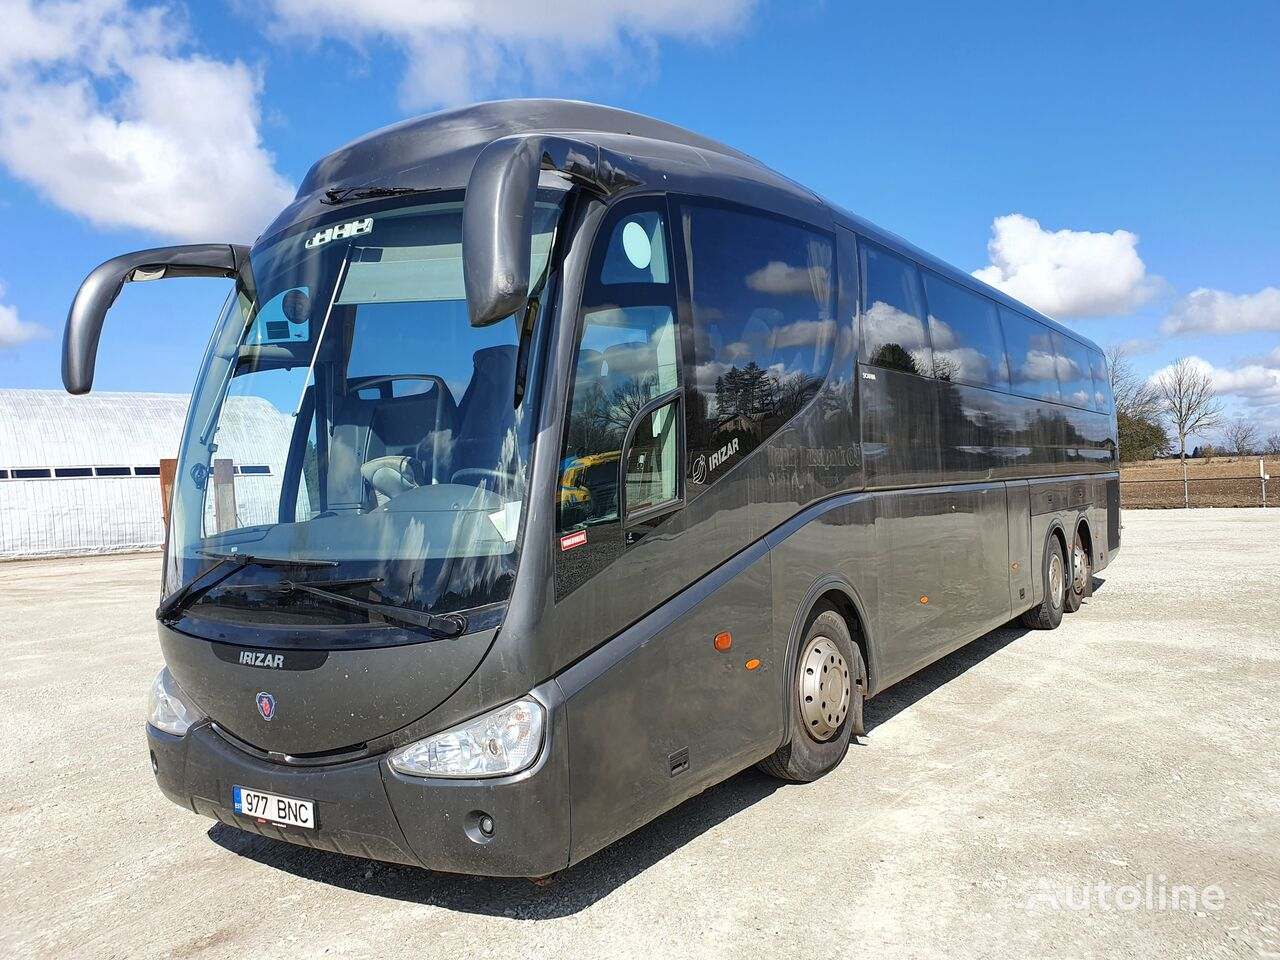 SCANIA Irizar K 420 interurban bus